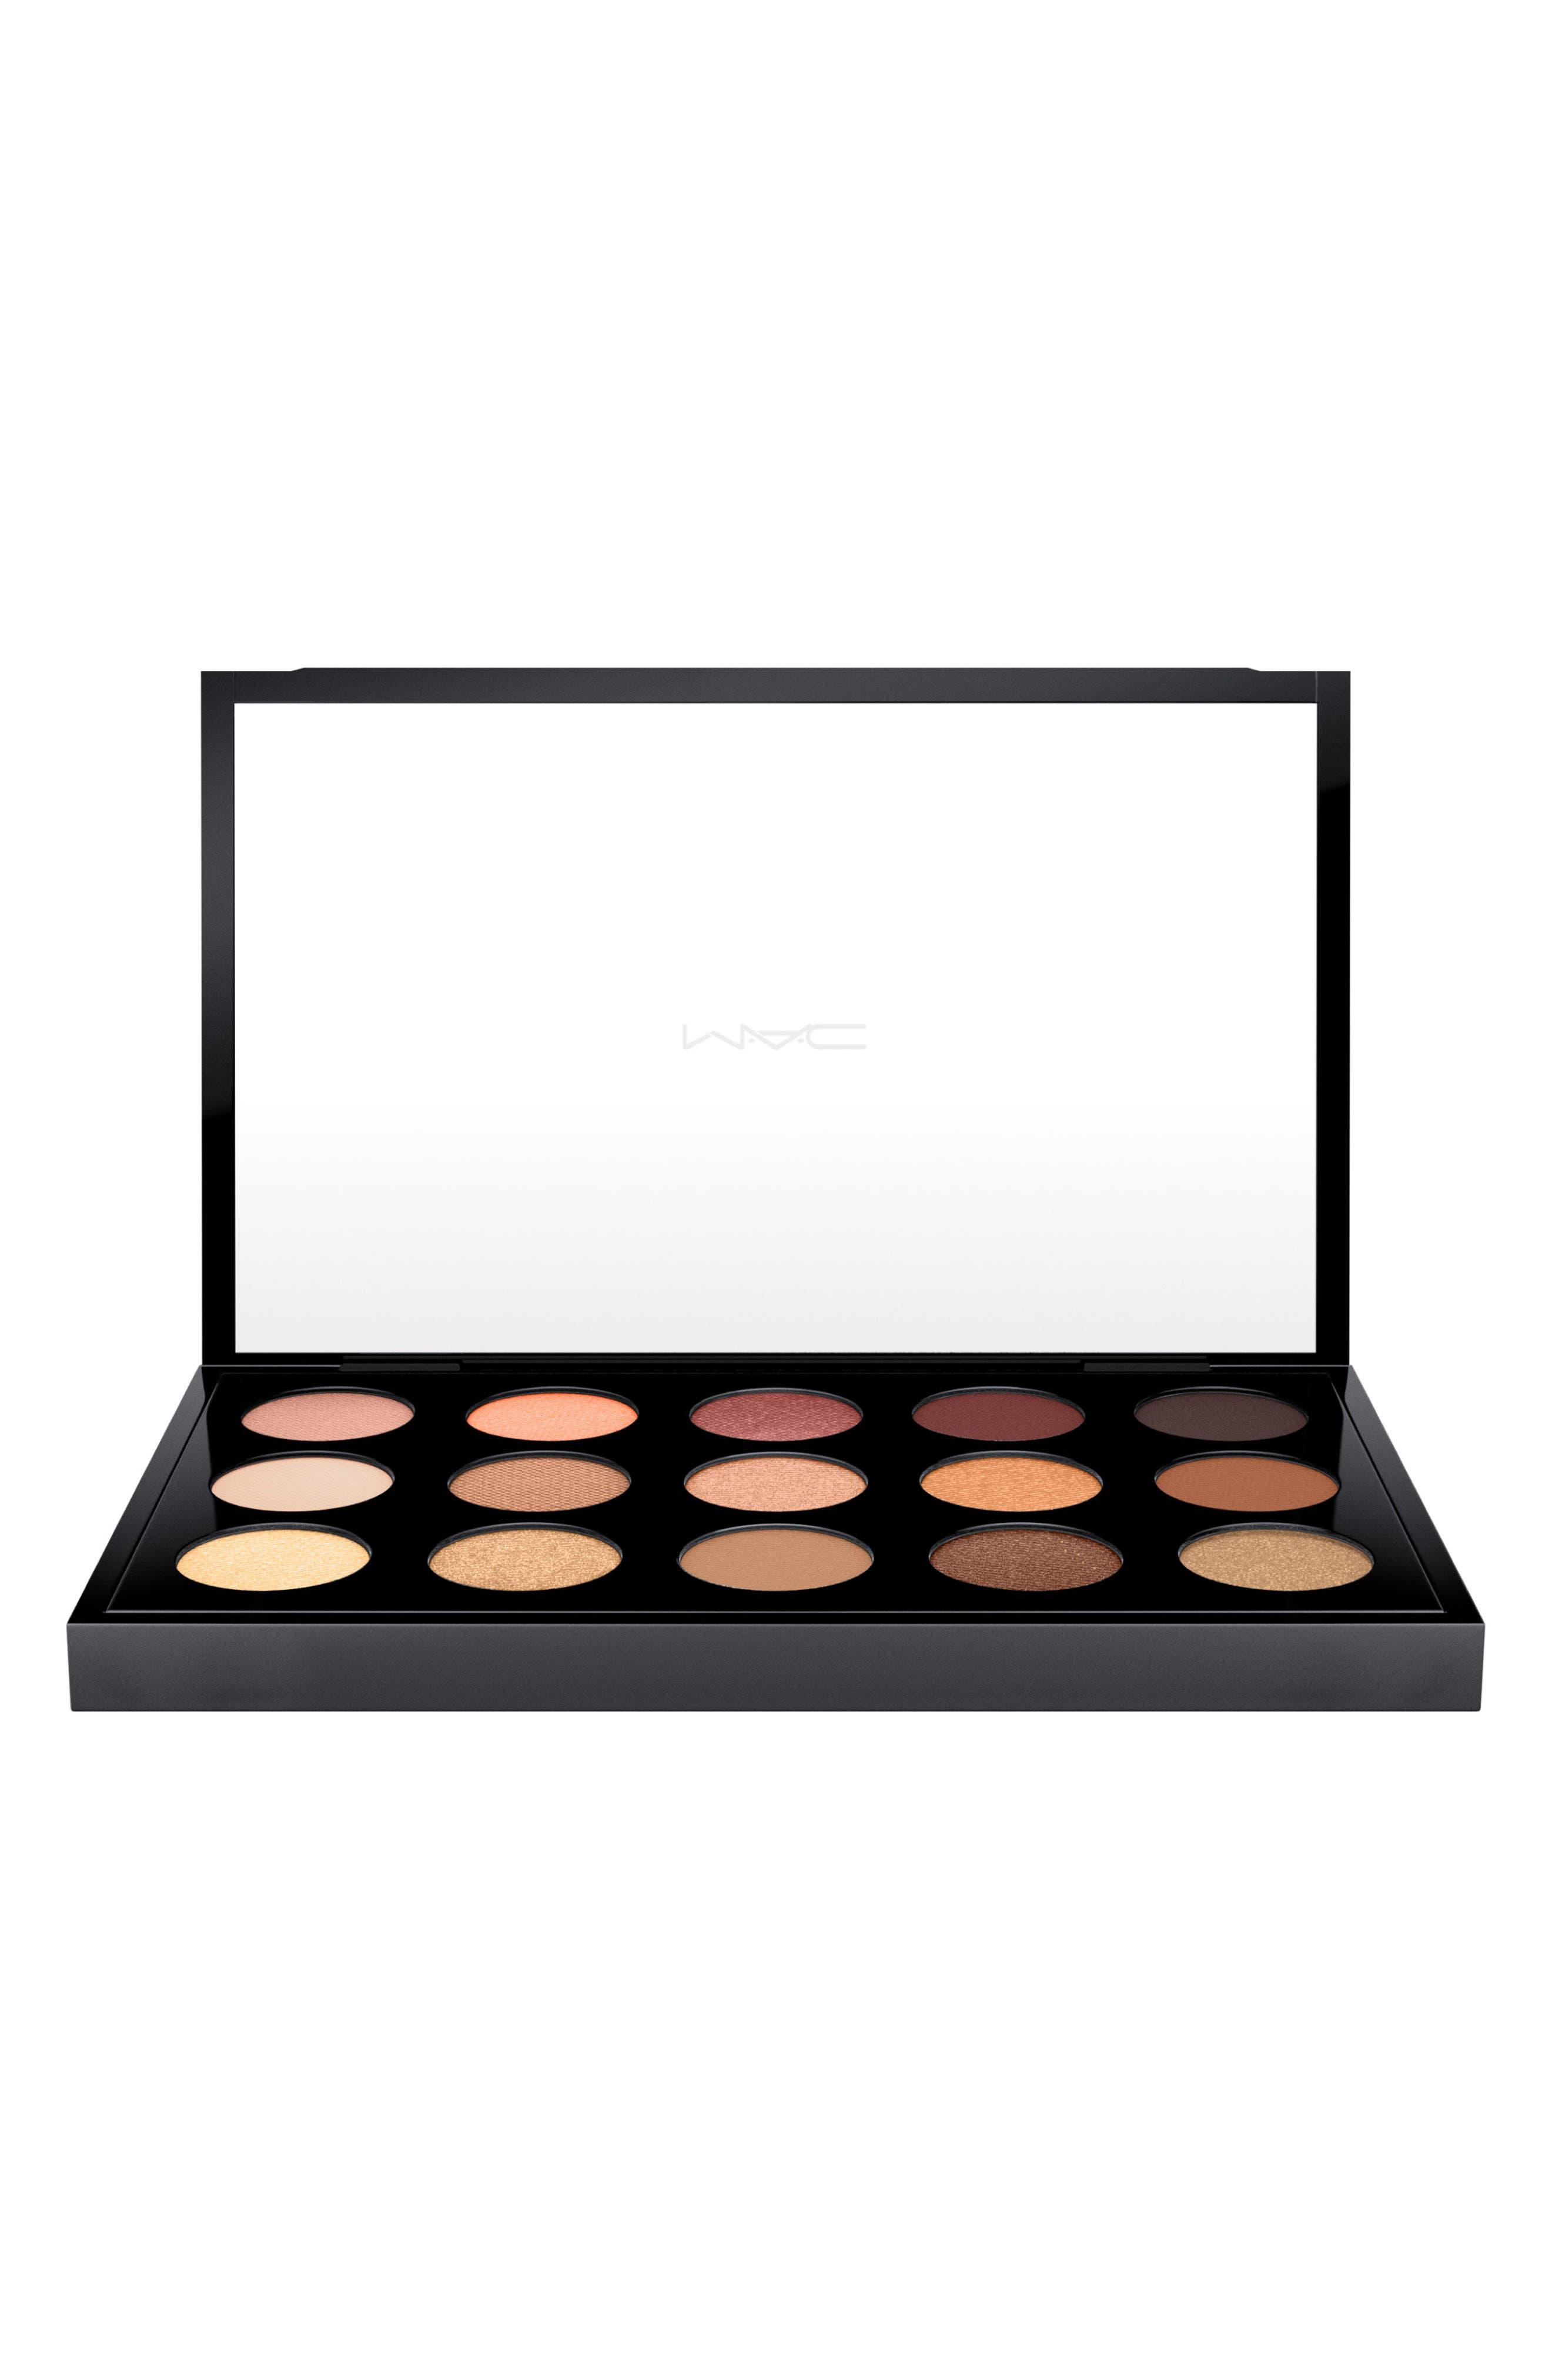 MAC Cool Neutral Times 15 Eyeshadow Palette,                             Alternate thumbnail 3, color,                             200